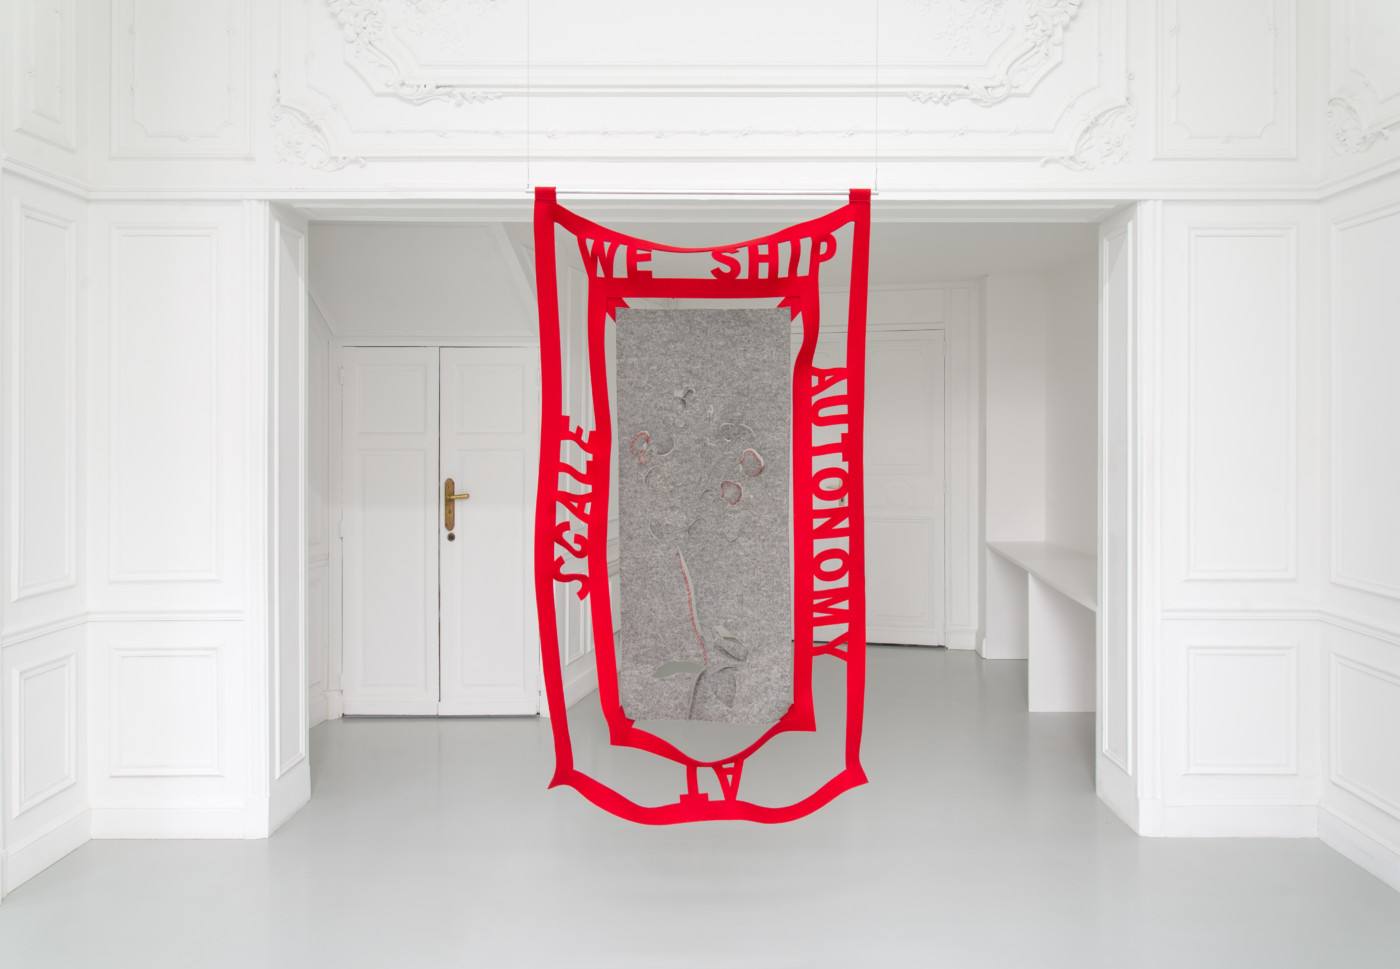 DENA YAGO  WE SHIP AUTONOMY AT SCALE , 2019 Pressed wool, silver, aluminum 160 x 91 cm / 63 x 35 7/8 in - High Art Gallery Paris